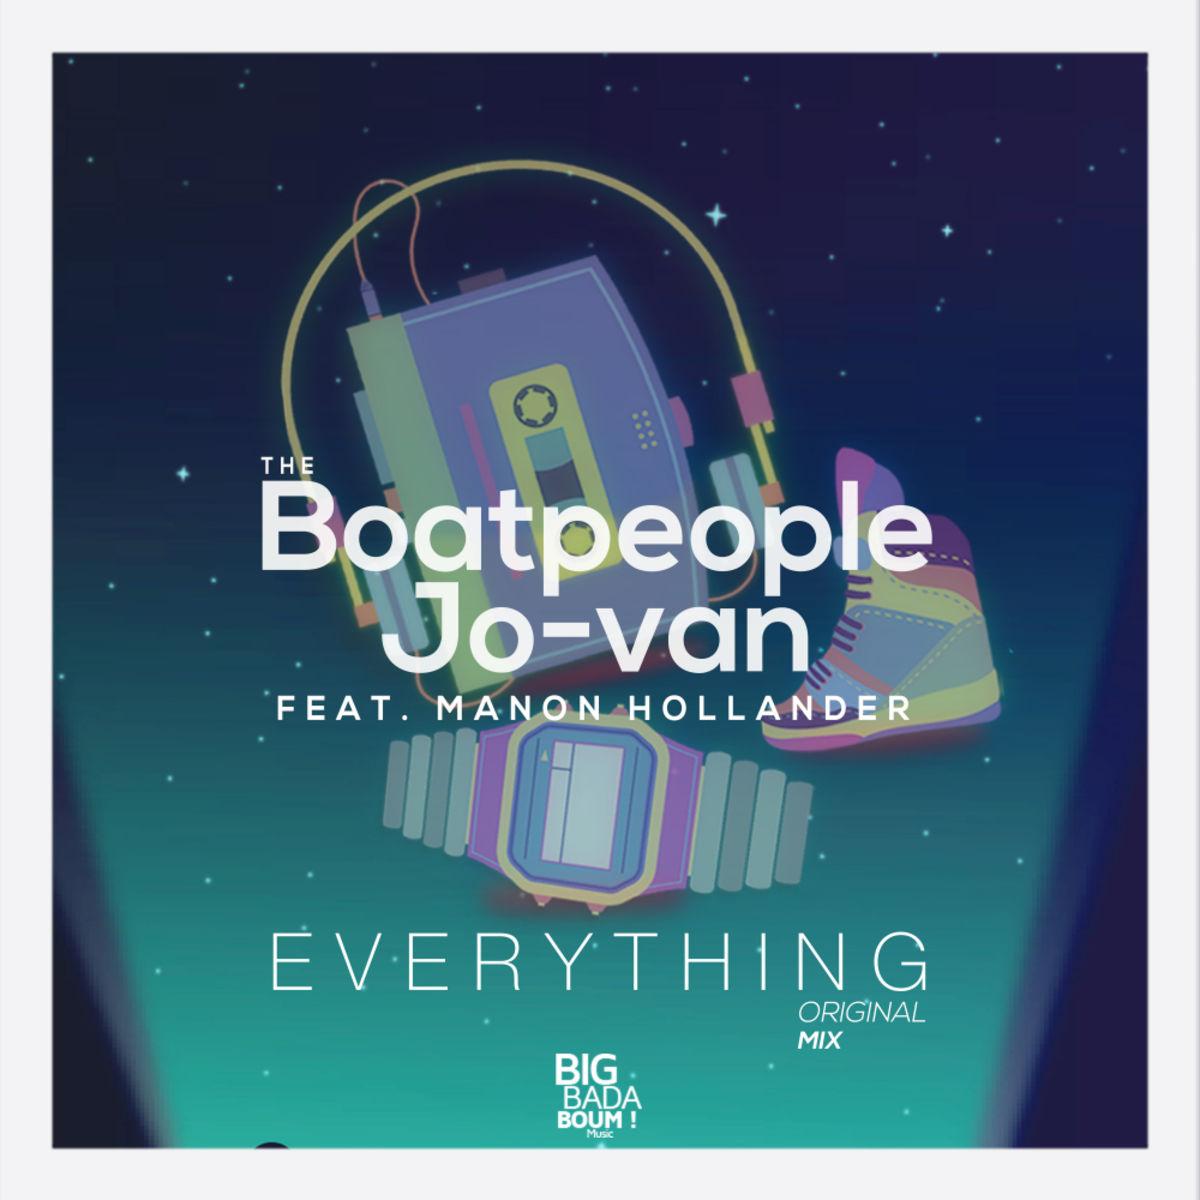 The Boatpeople, Jo-Van, Manon Hollander - Everything  (Original Mix)